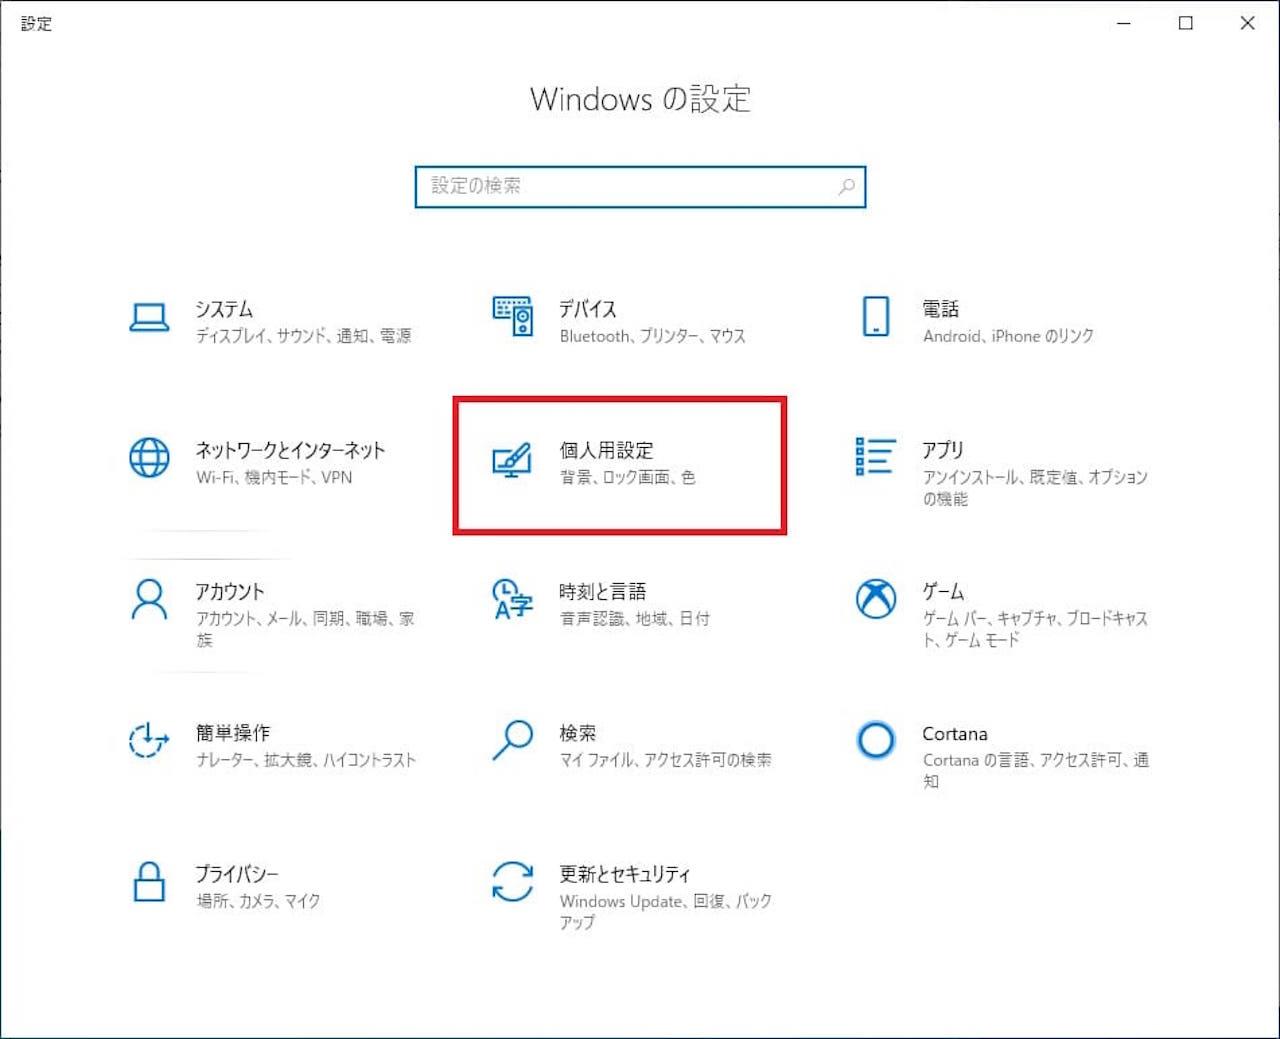 Windows10でスタートメニューの全画面表示を解除する方法③